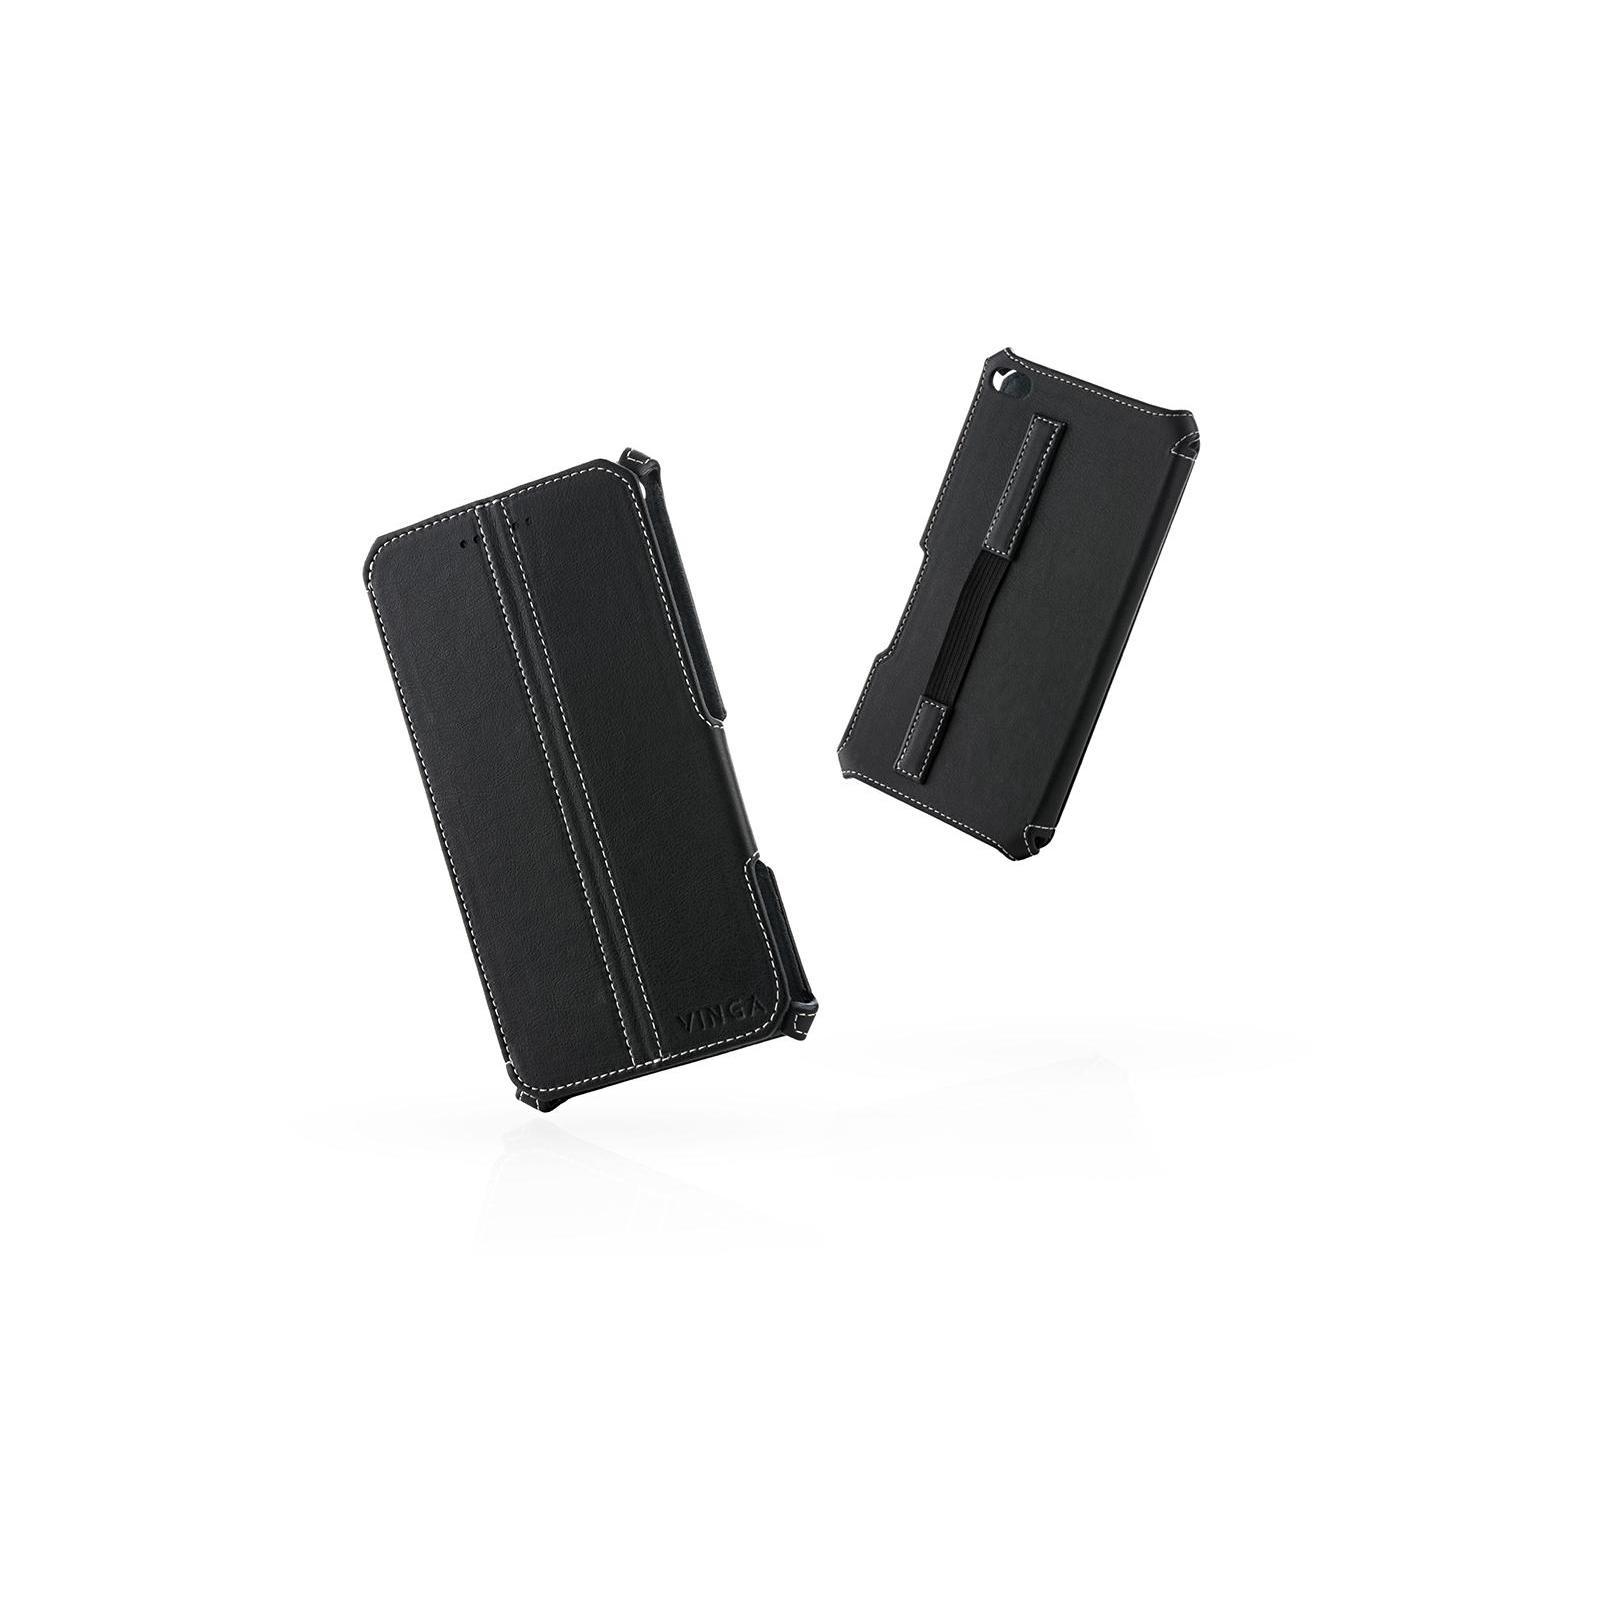 Чехол для планшета Lenovo Tab 4 7 TB-7304I black Vinga (VNTB7304I) изображение 3